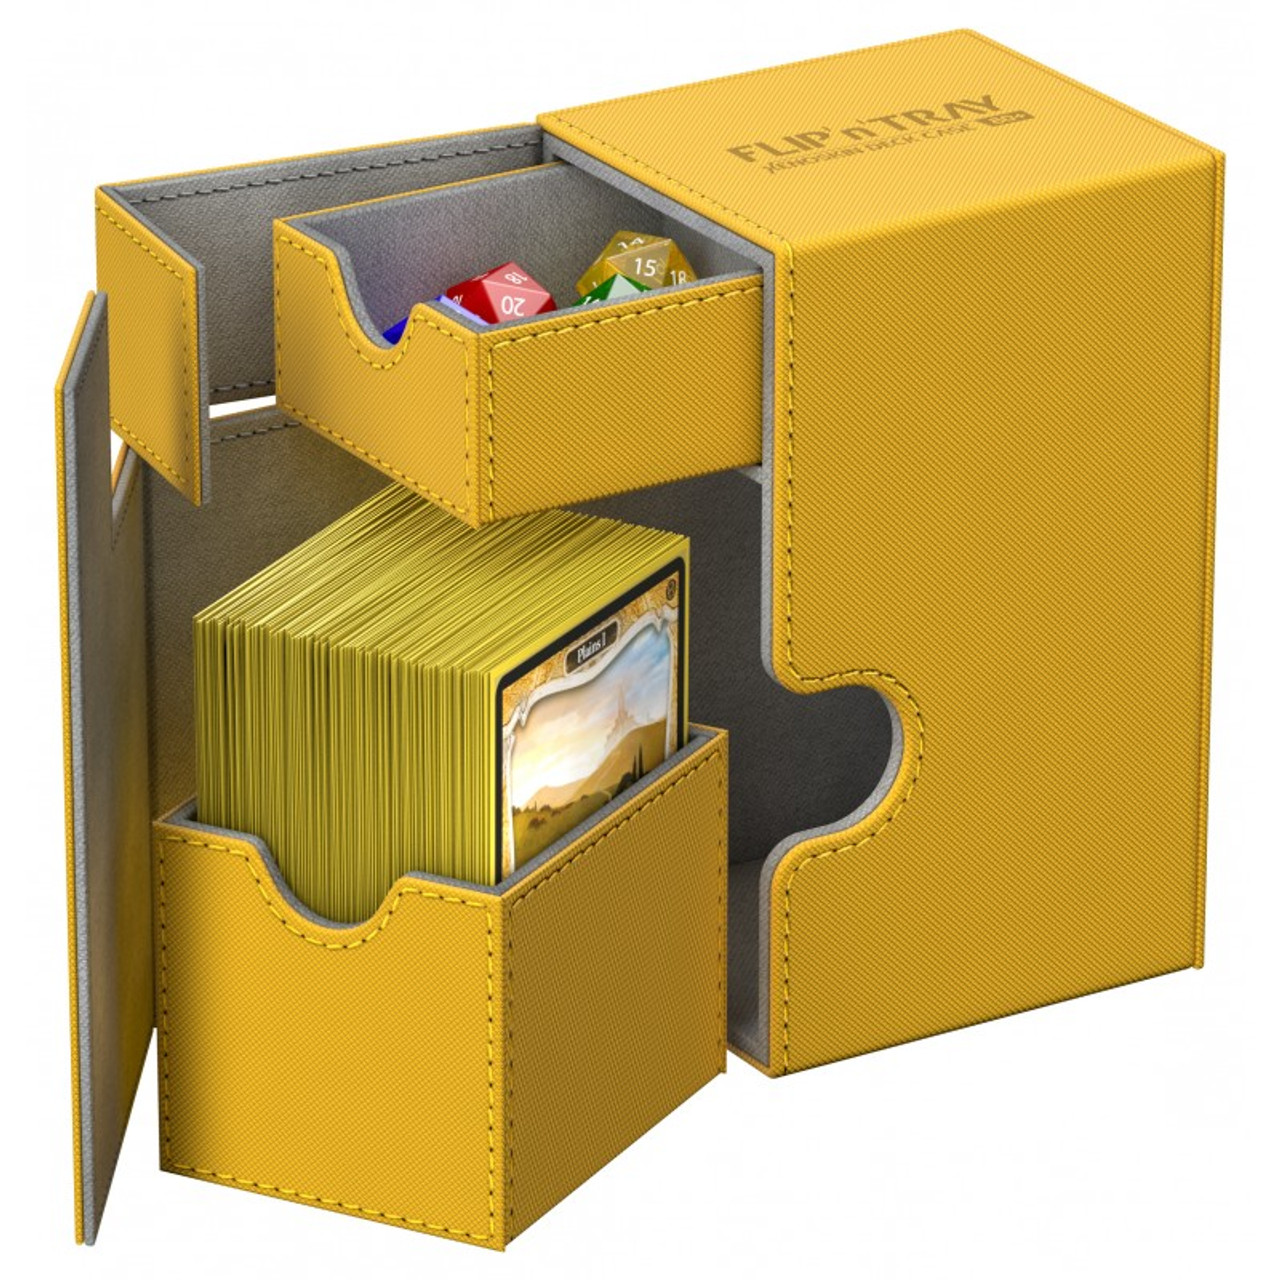 ULTIMATE GUARD FLIP n TRAY GREY 80 XENOSKIN DECK CASE Card Box Standard Size